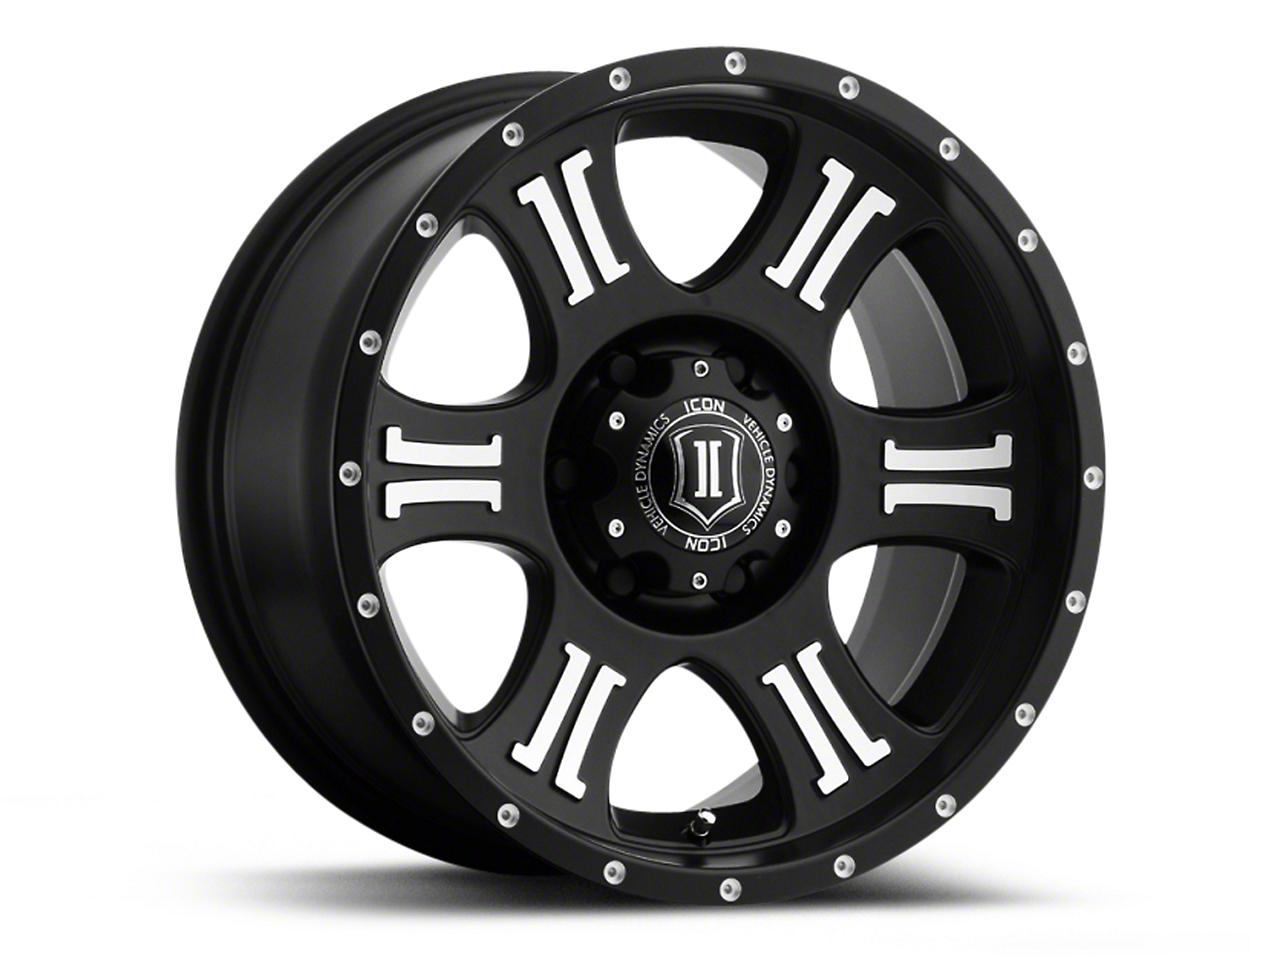 ICON Vehicle Dynamics Shield Satin Black Machined Wheels (07-18 Wrangler JK; 2018 Wrangler JL)